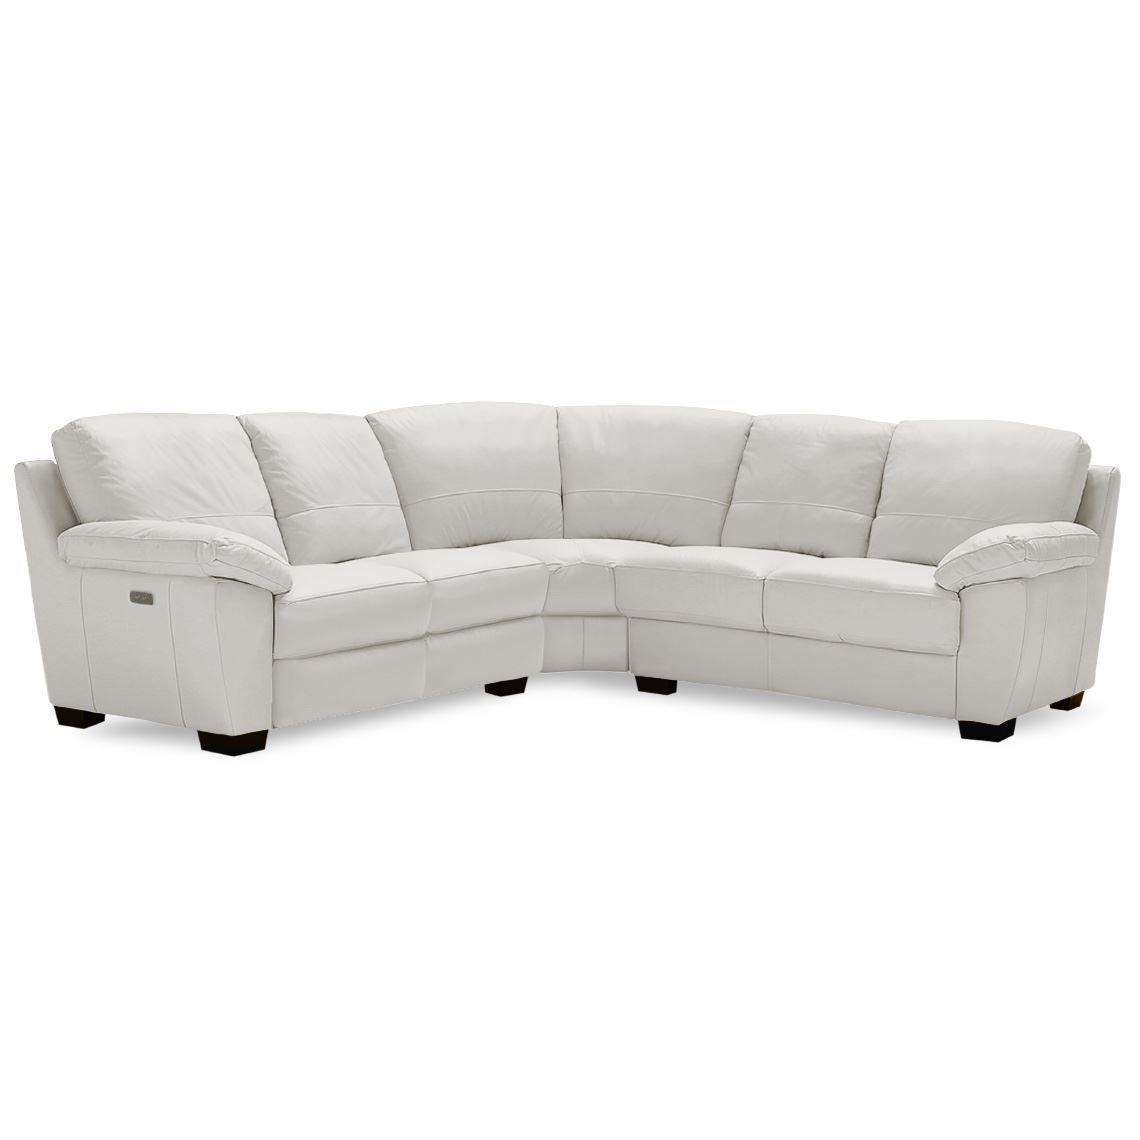 Lucas R 5 Seat Leather Seat Modular Recliner Sofa Products Leather Reclining Sofa Reclining Sofa Sofa